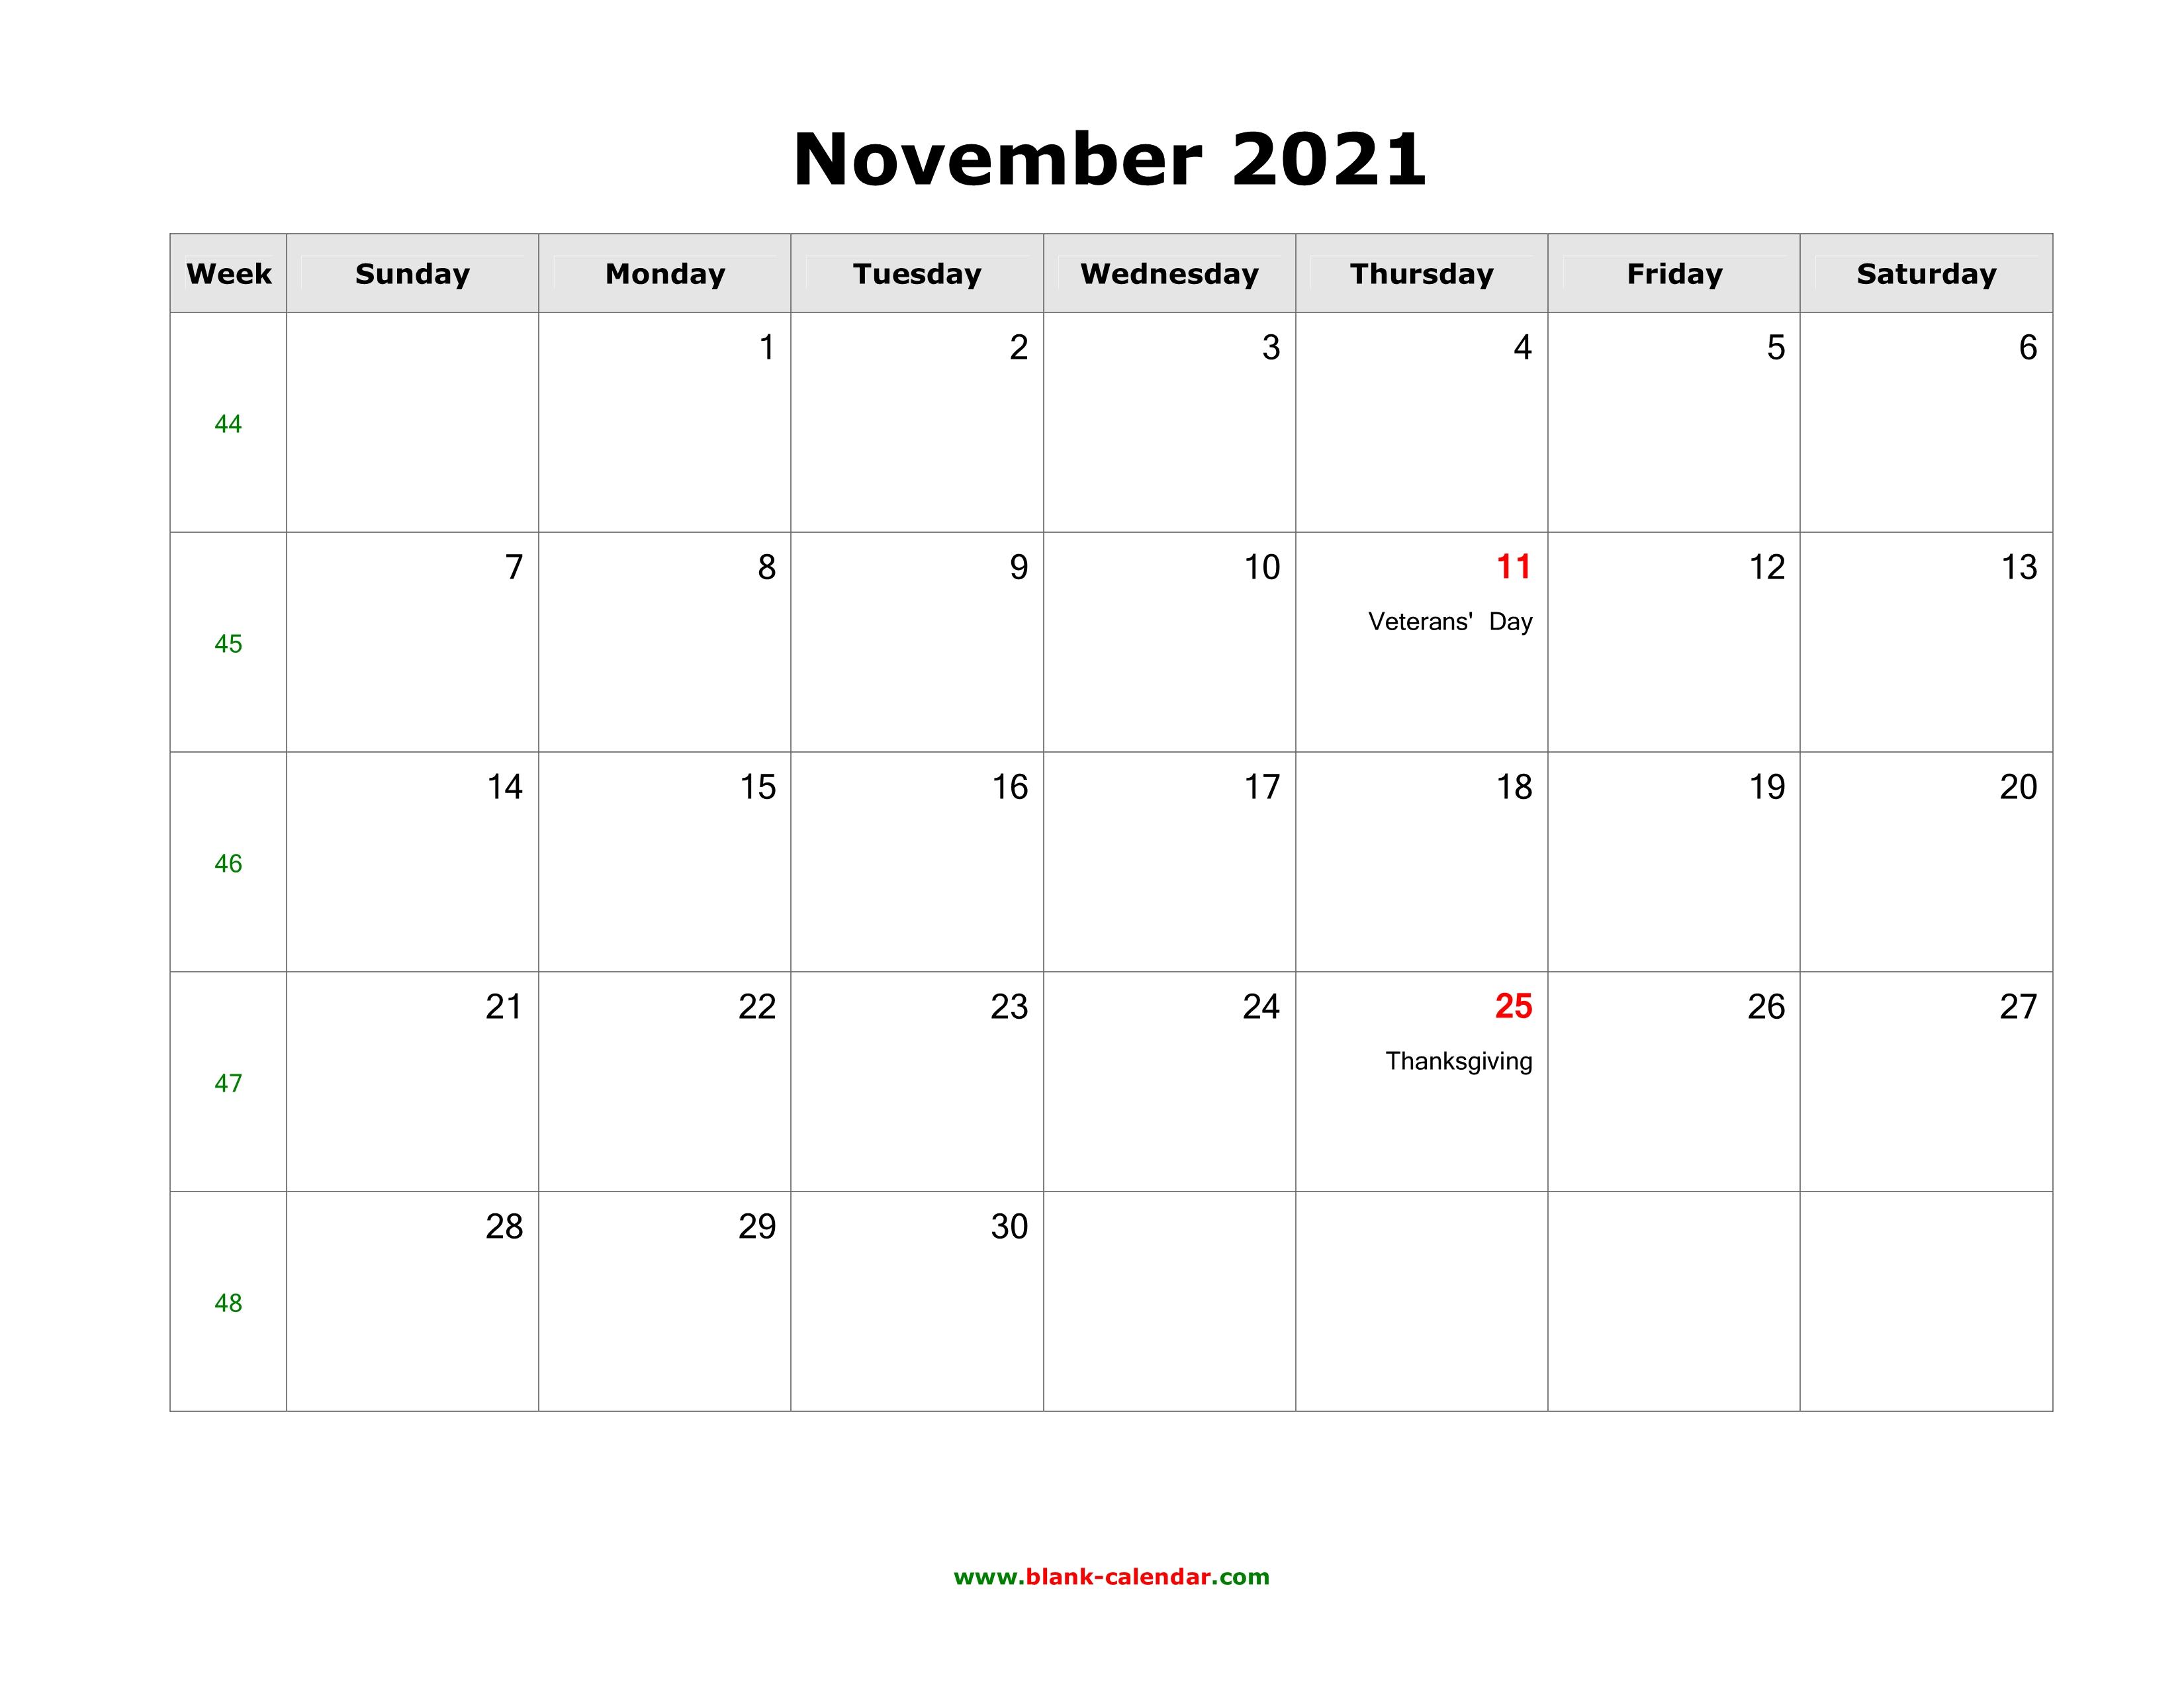 November 2021 Blank Calendar   Free Download Calendar ...